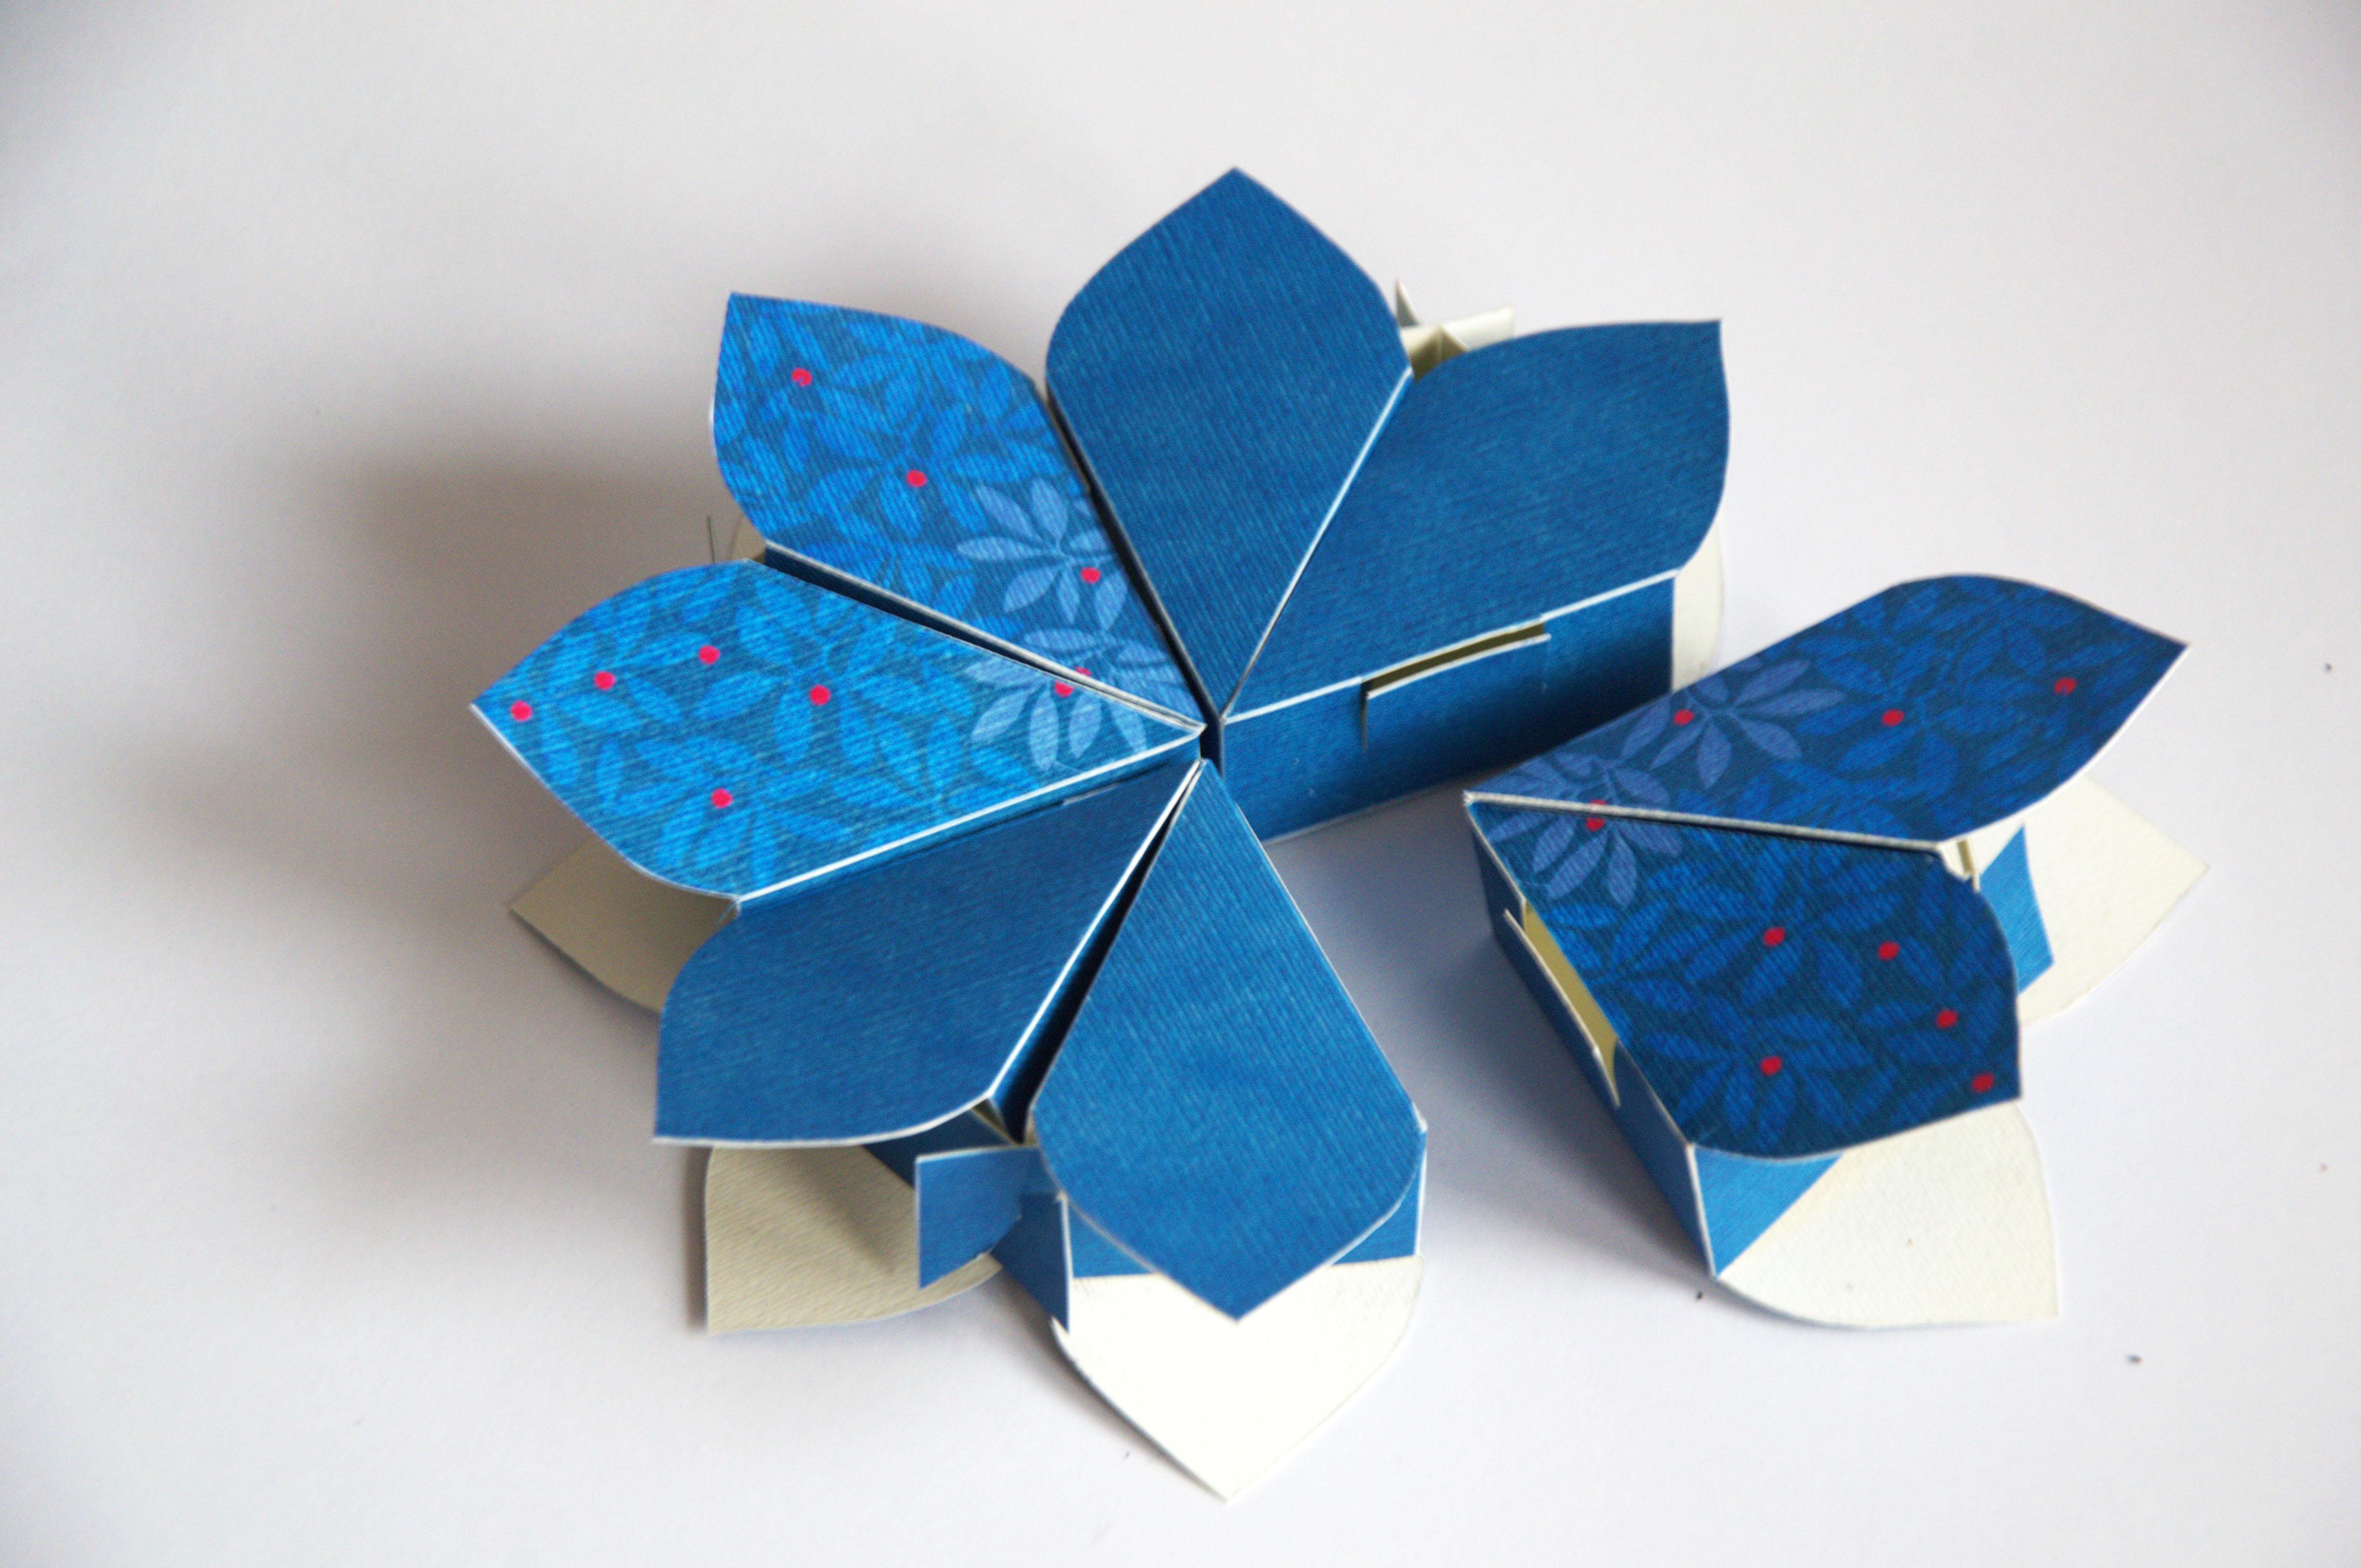 Конструктивная упаковка для чая пуэр